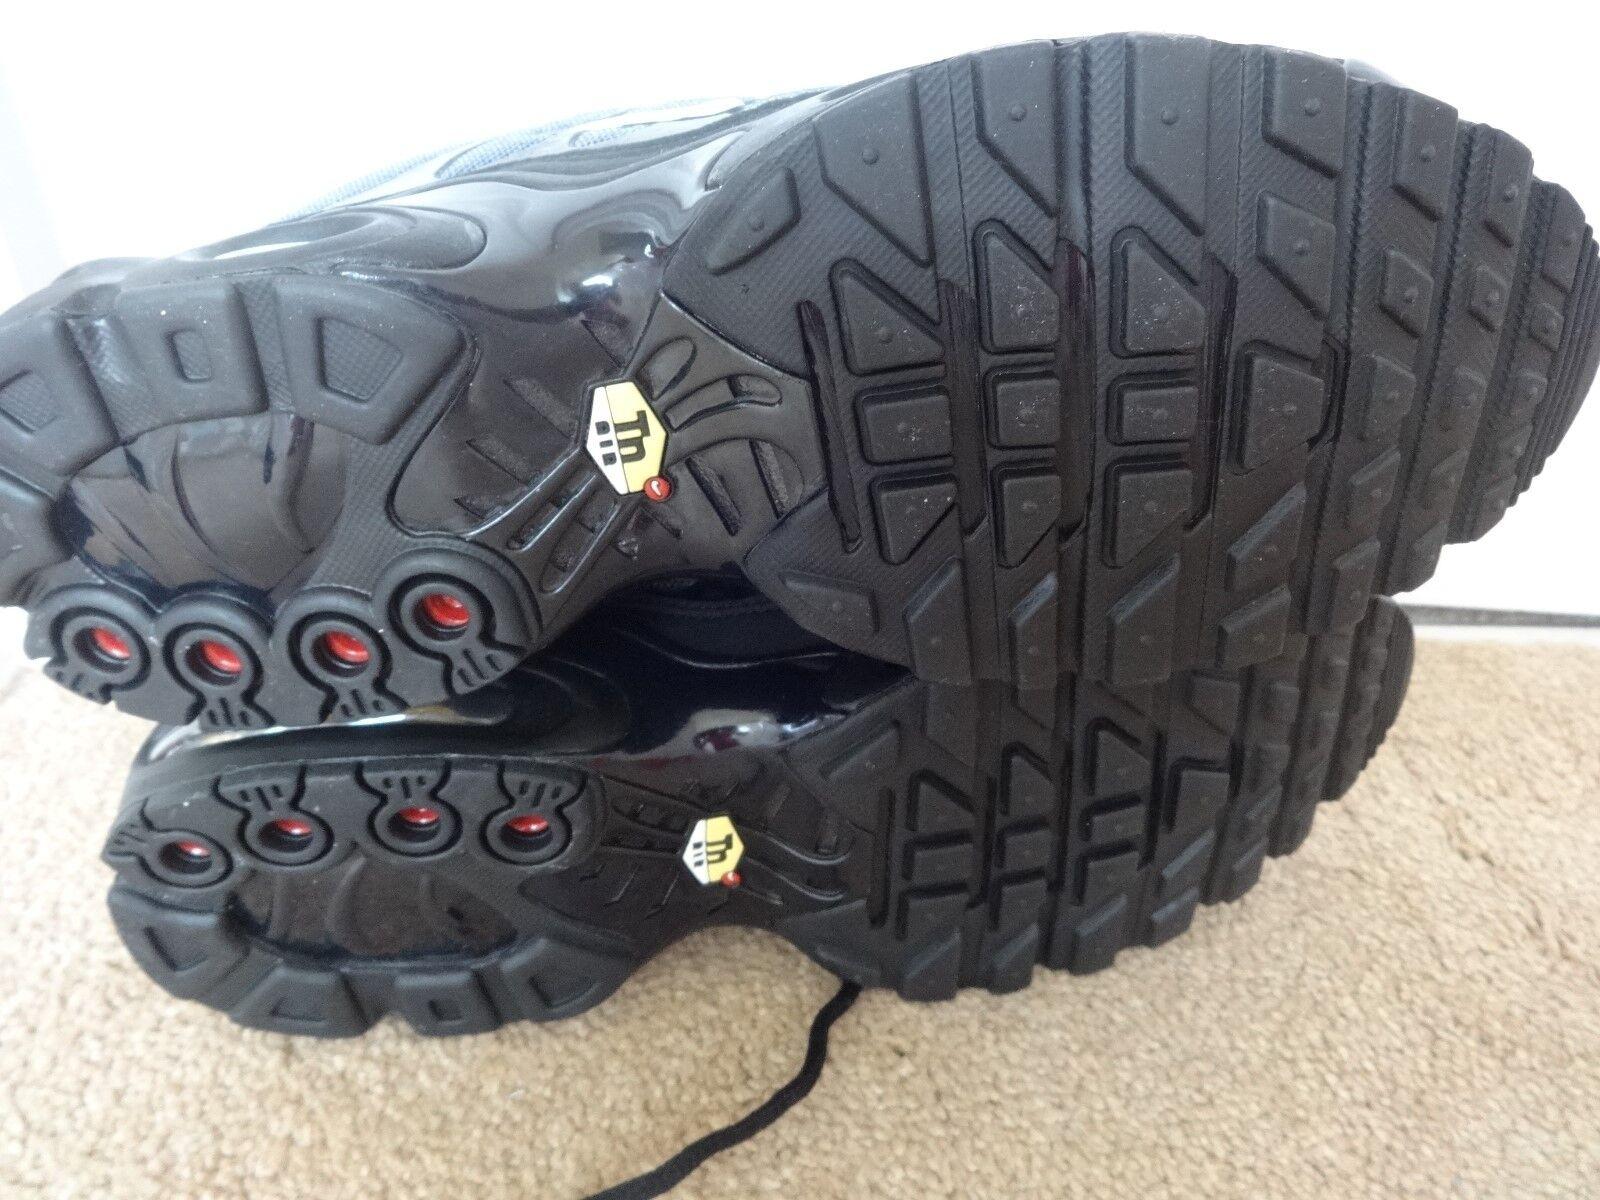 Nike Air max plus TXT trainers sneakers 647315 019 uk 7 6 eu 40 us 7 uk NEW+BOX 772d0f